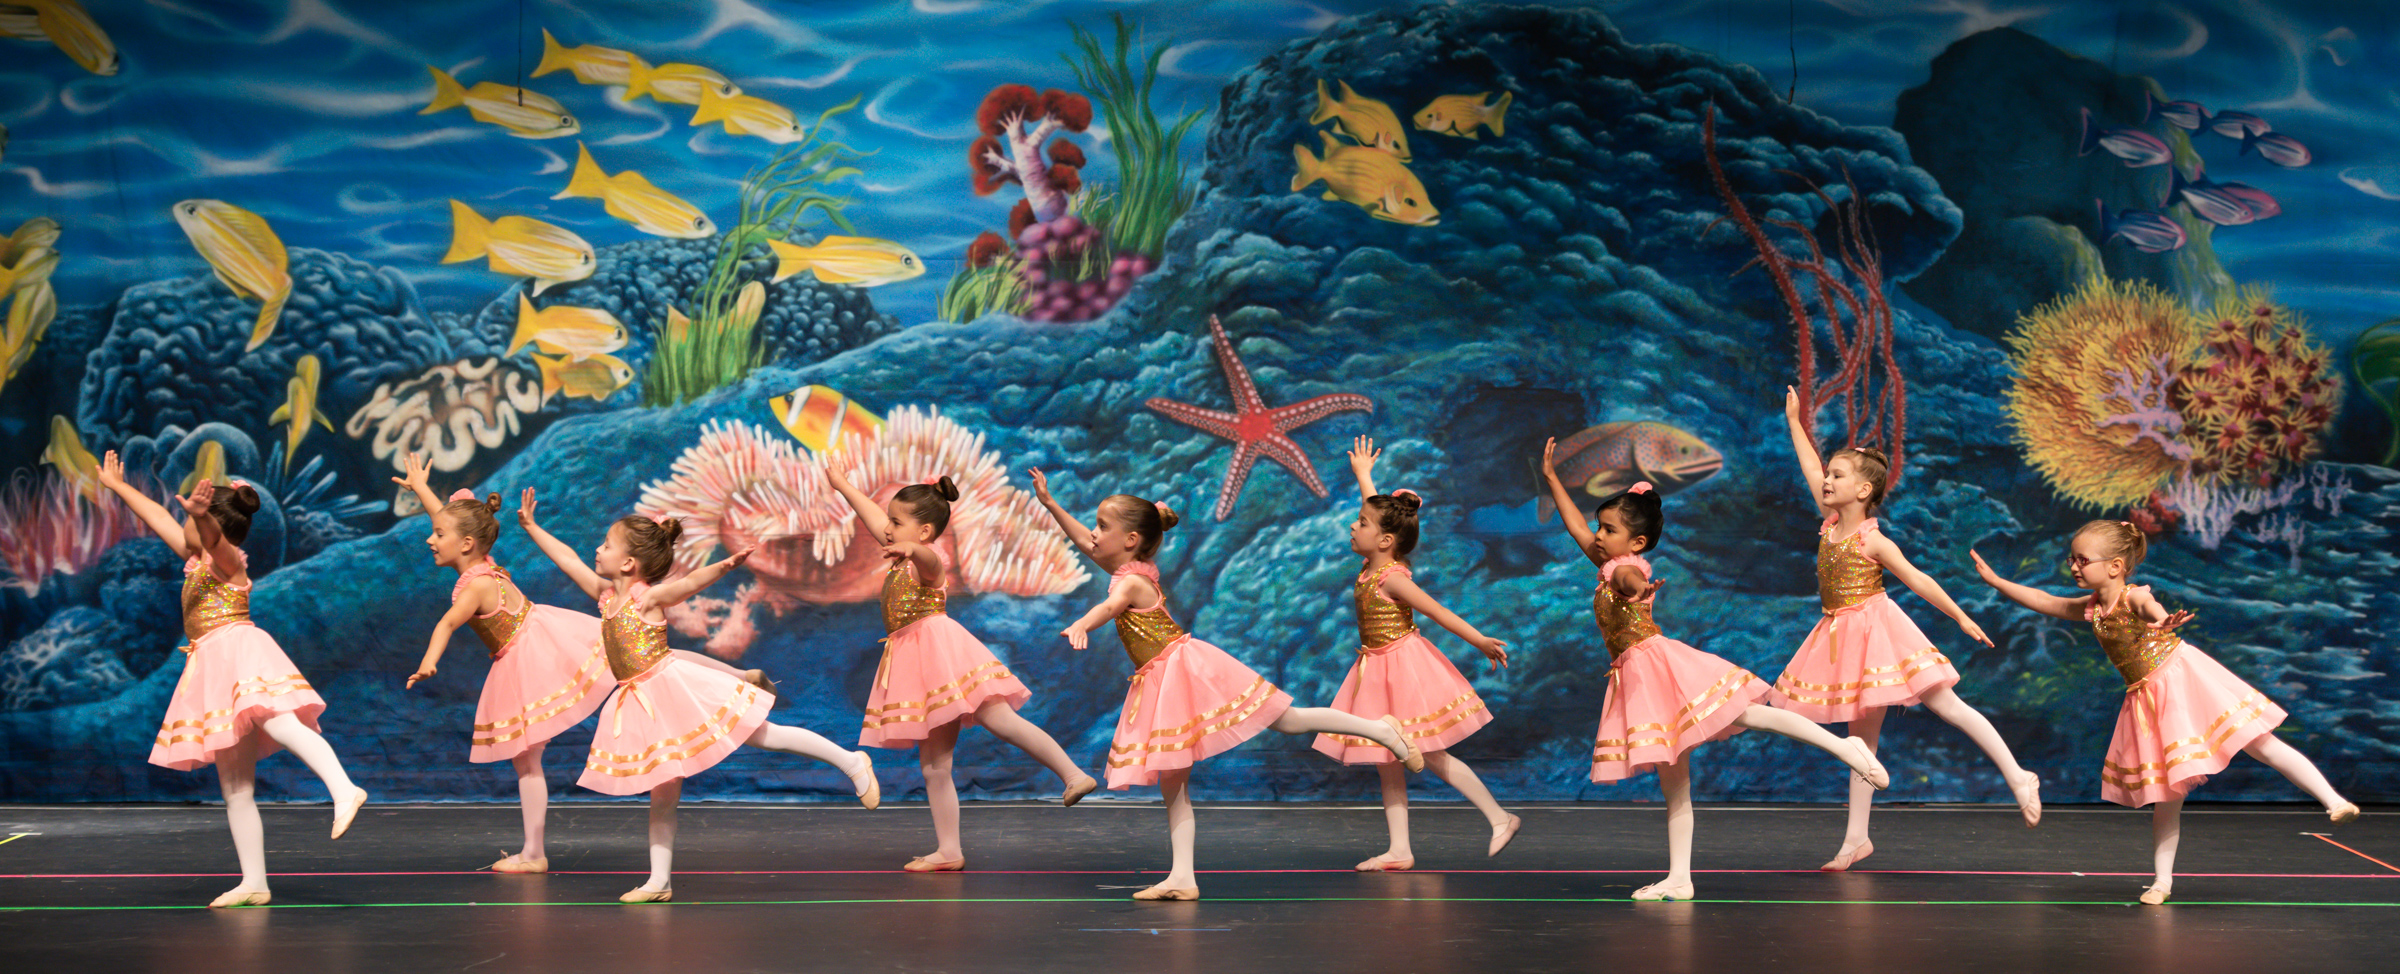 Tiny Dancers - Little Mermaid_04728.jpg